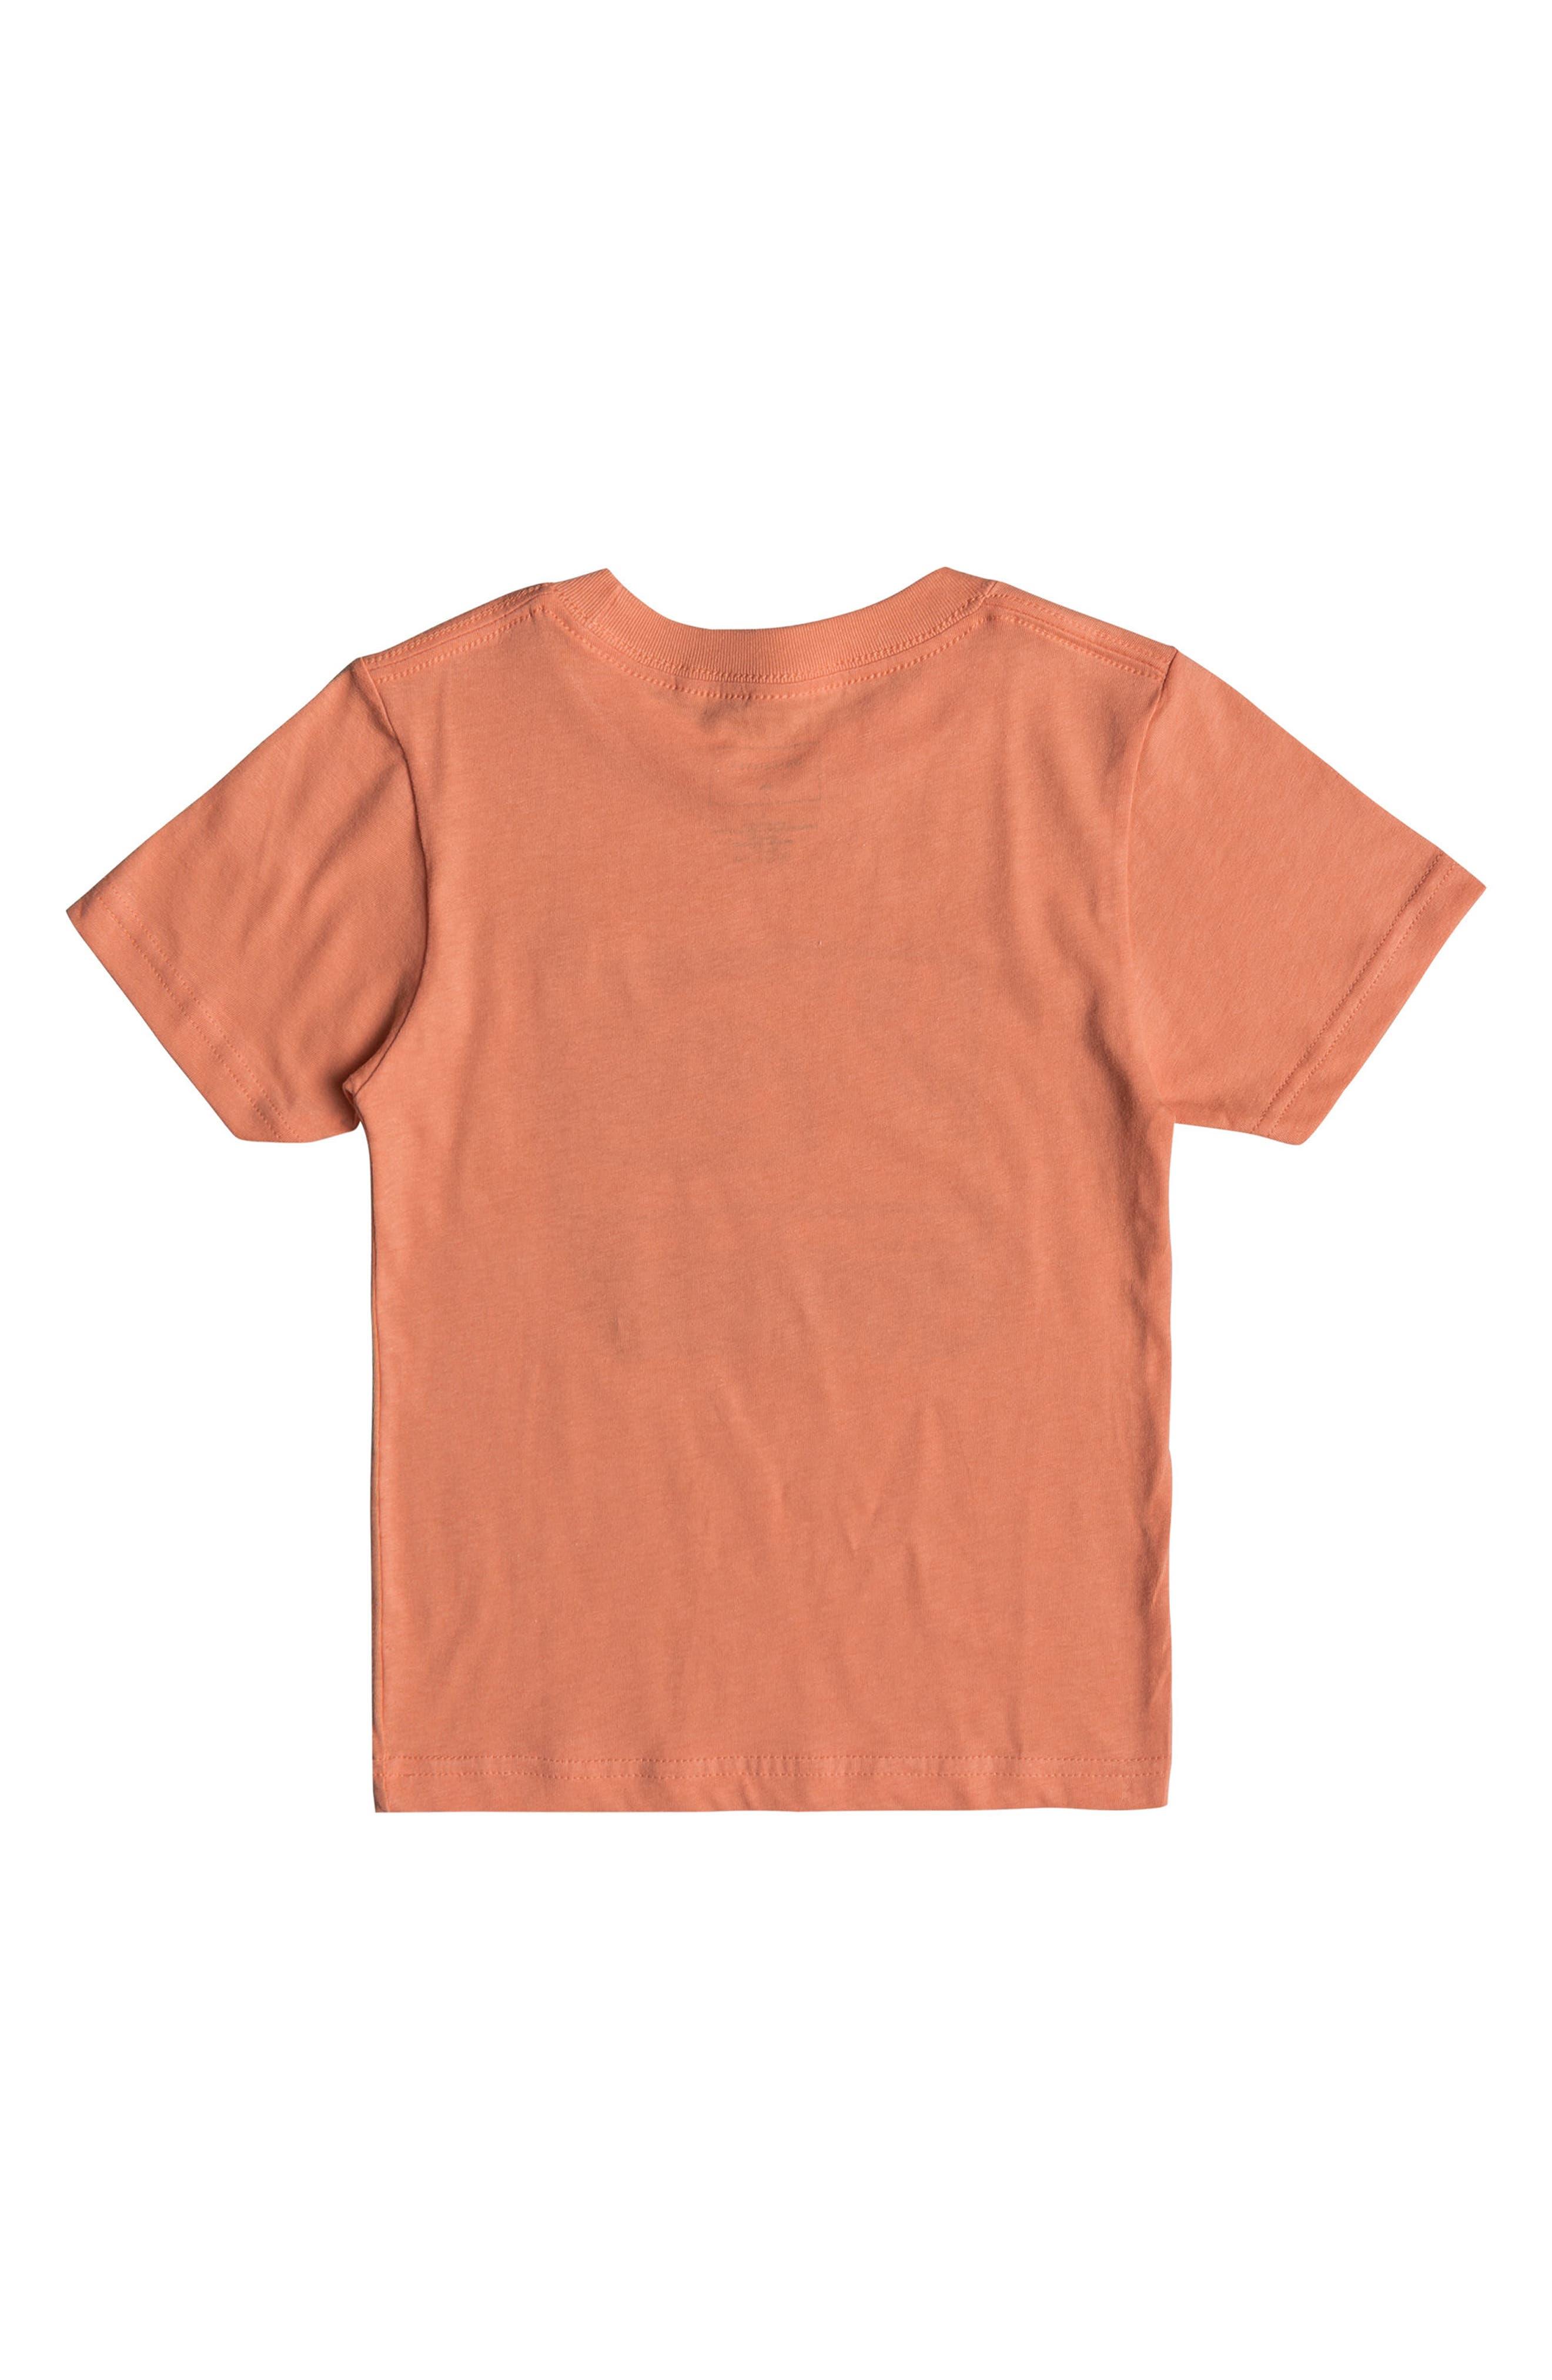 Alternate Image 2  - Quiksilver Wemi Graphic T-Shirt (Toddler Boys & Little Boys)